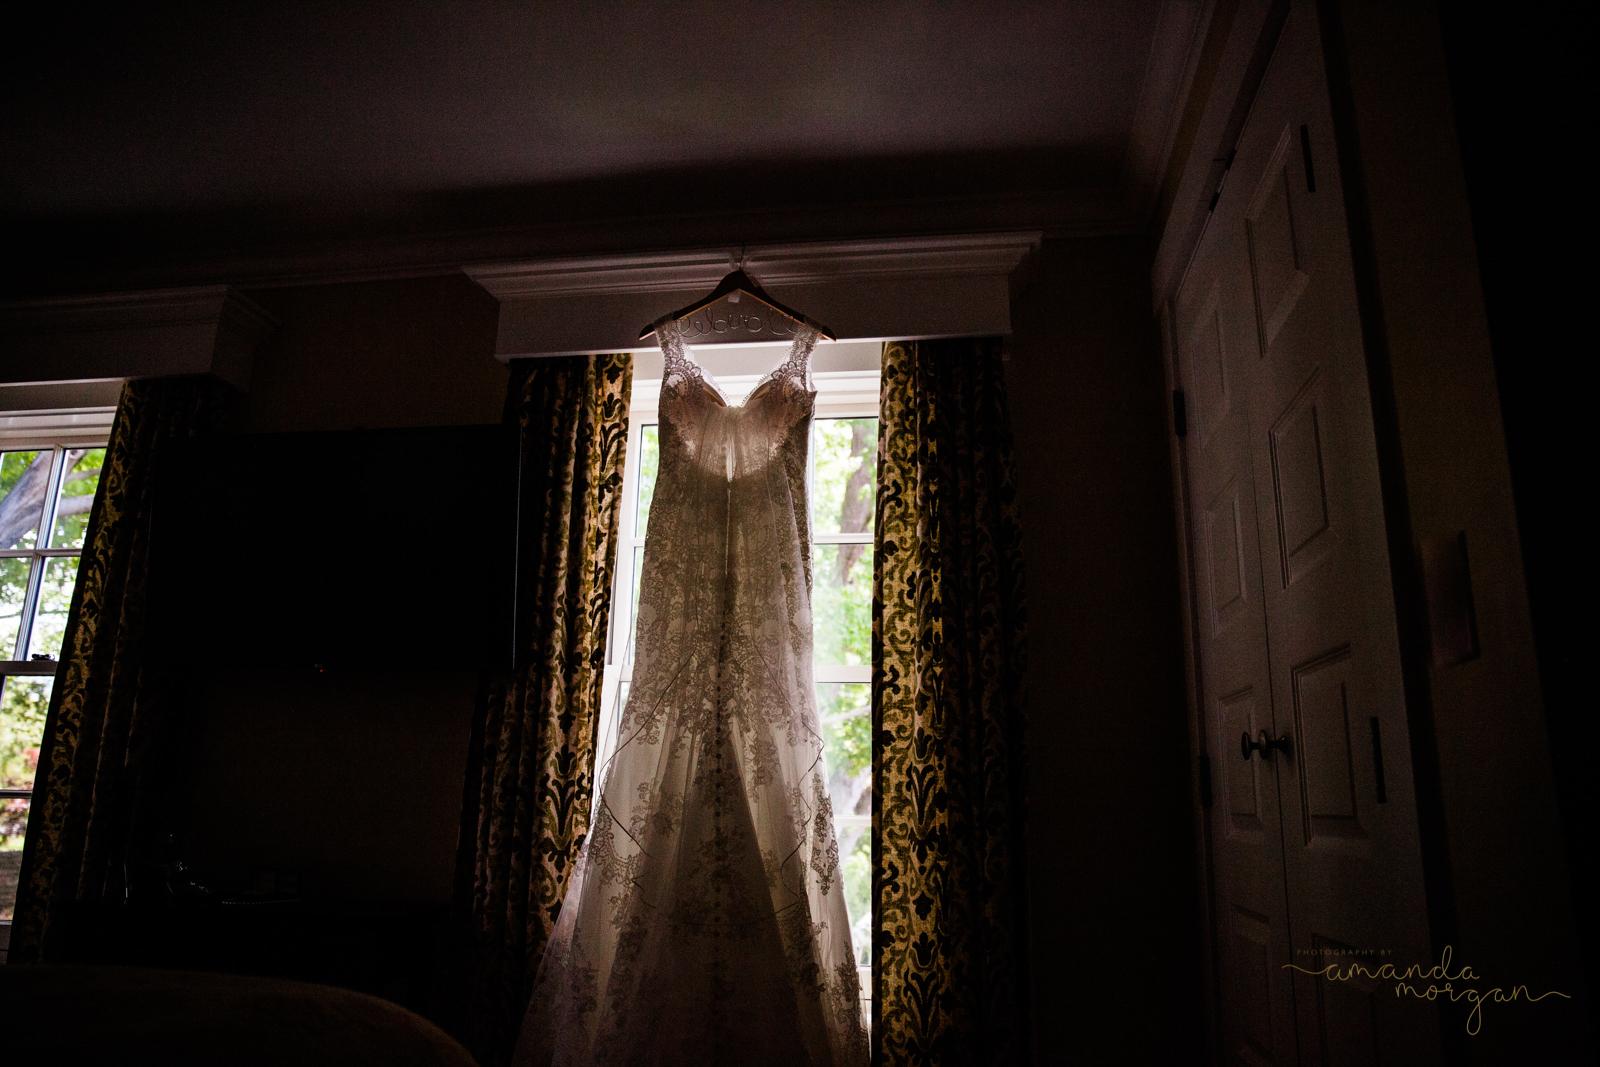 Publick-House-Wedding-Amanda-Morgan-2.jpg